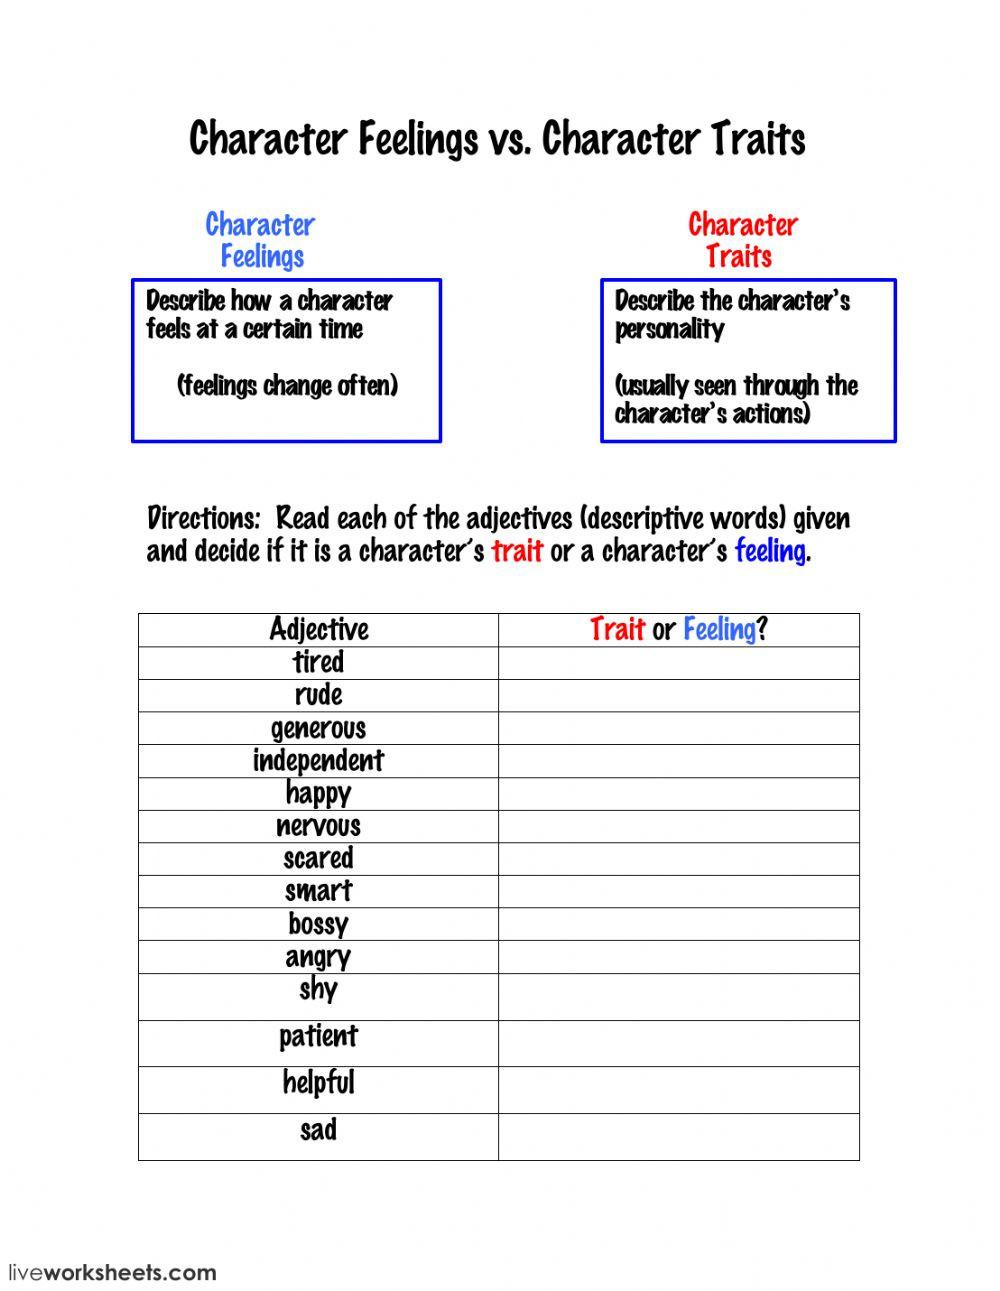 Character Traits Worksheet Pdf Character Traits Vs Character Feelings Interactive Worksheet